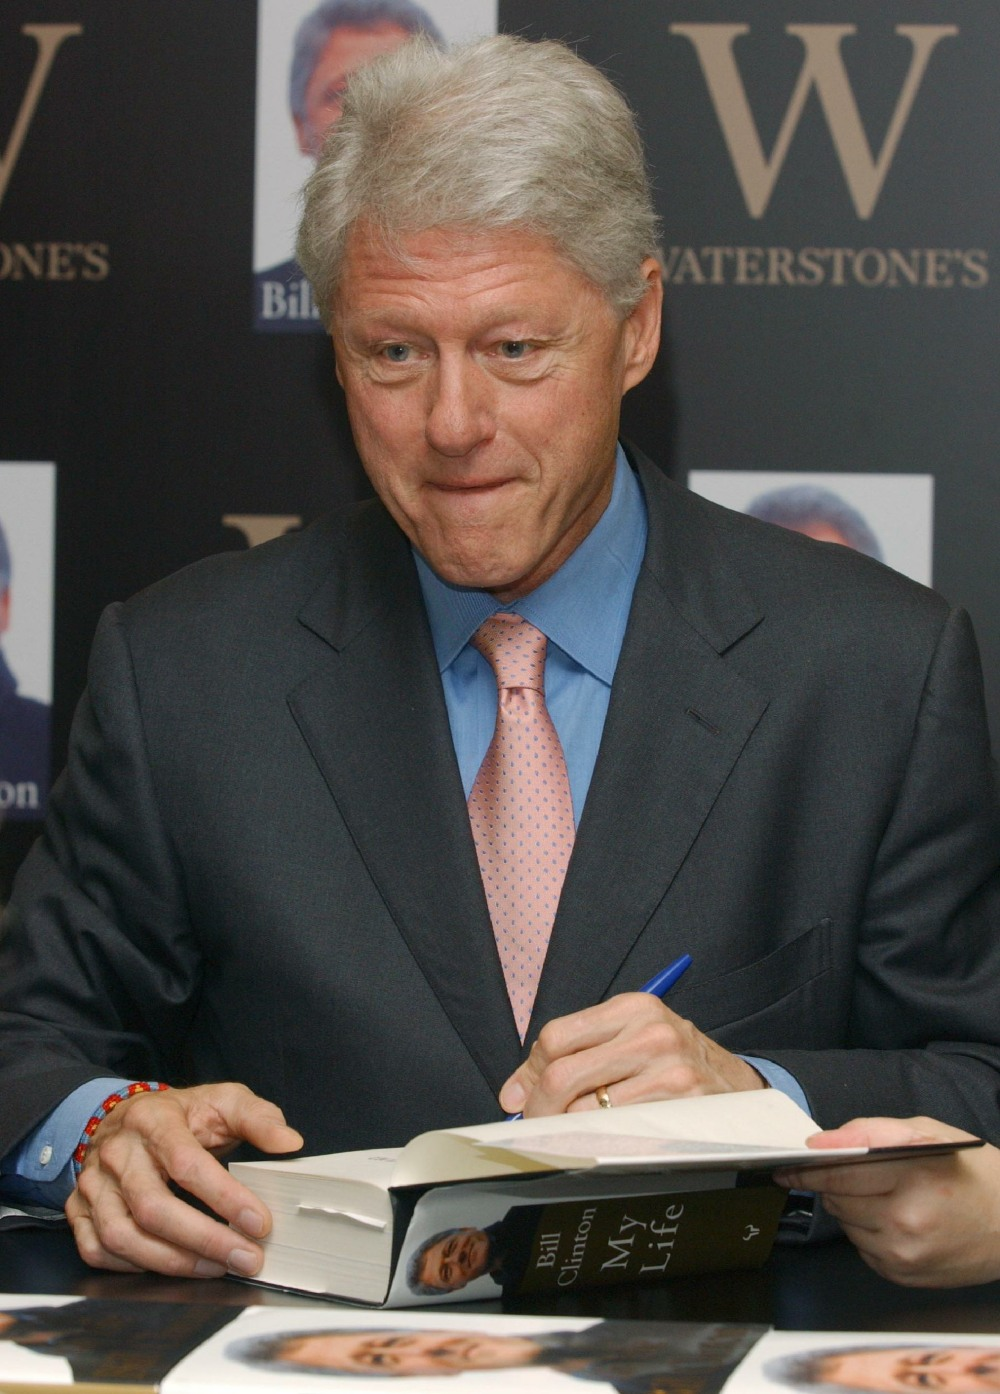 Bill Clinton Book Signing